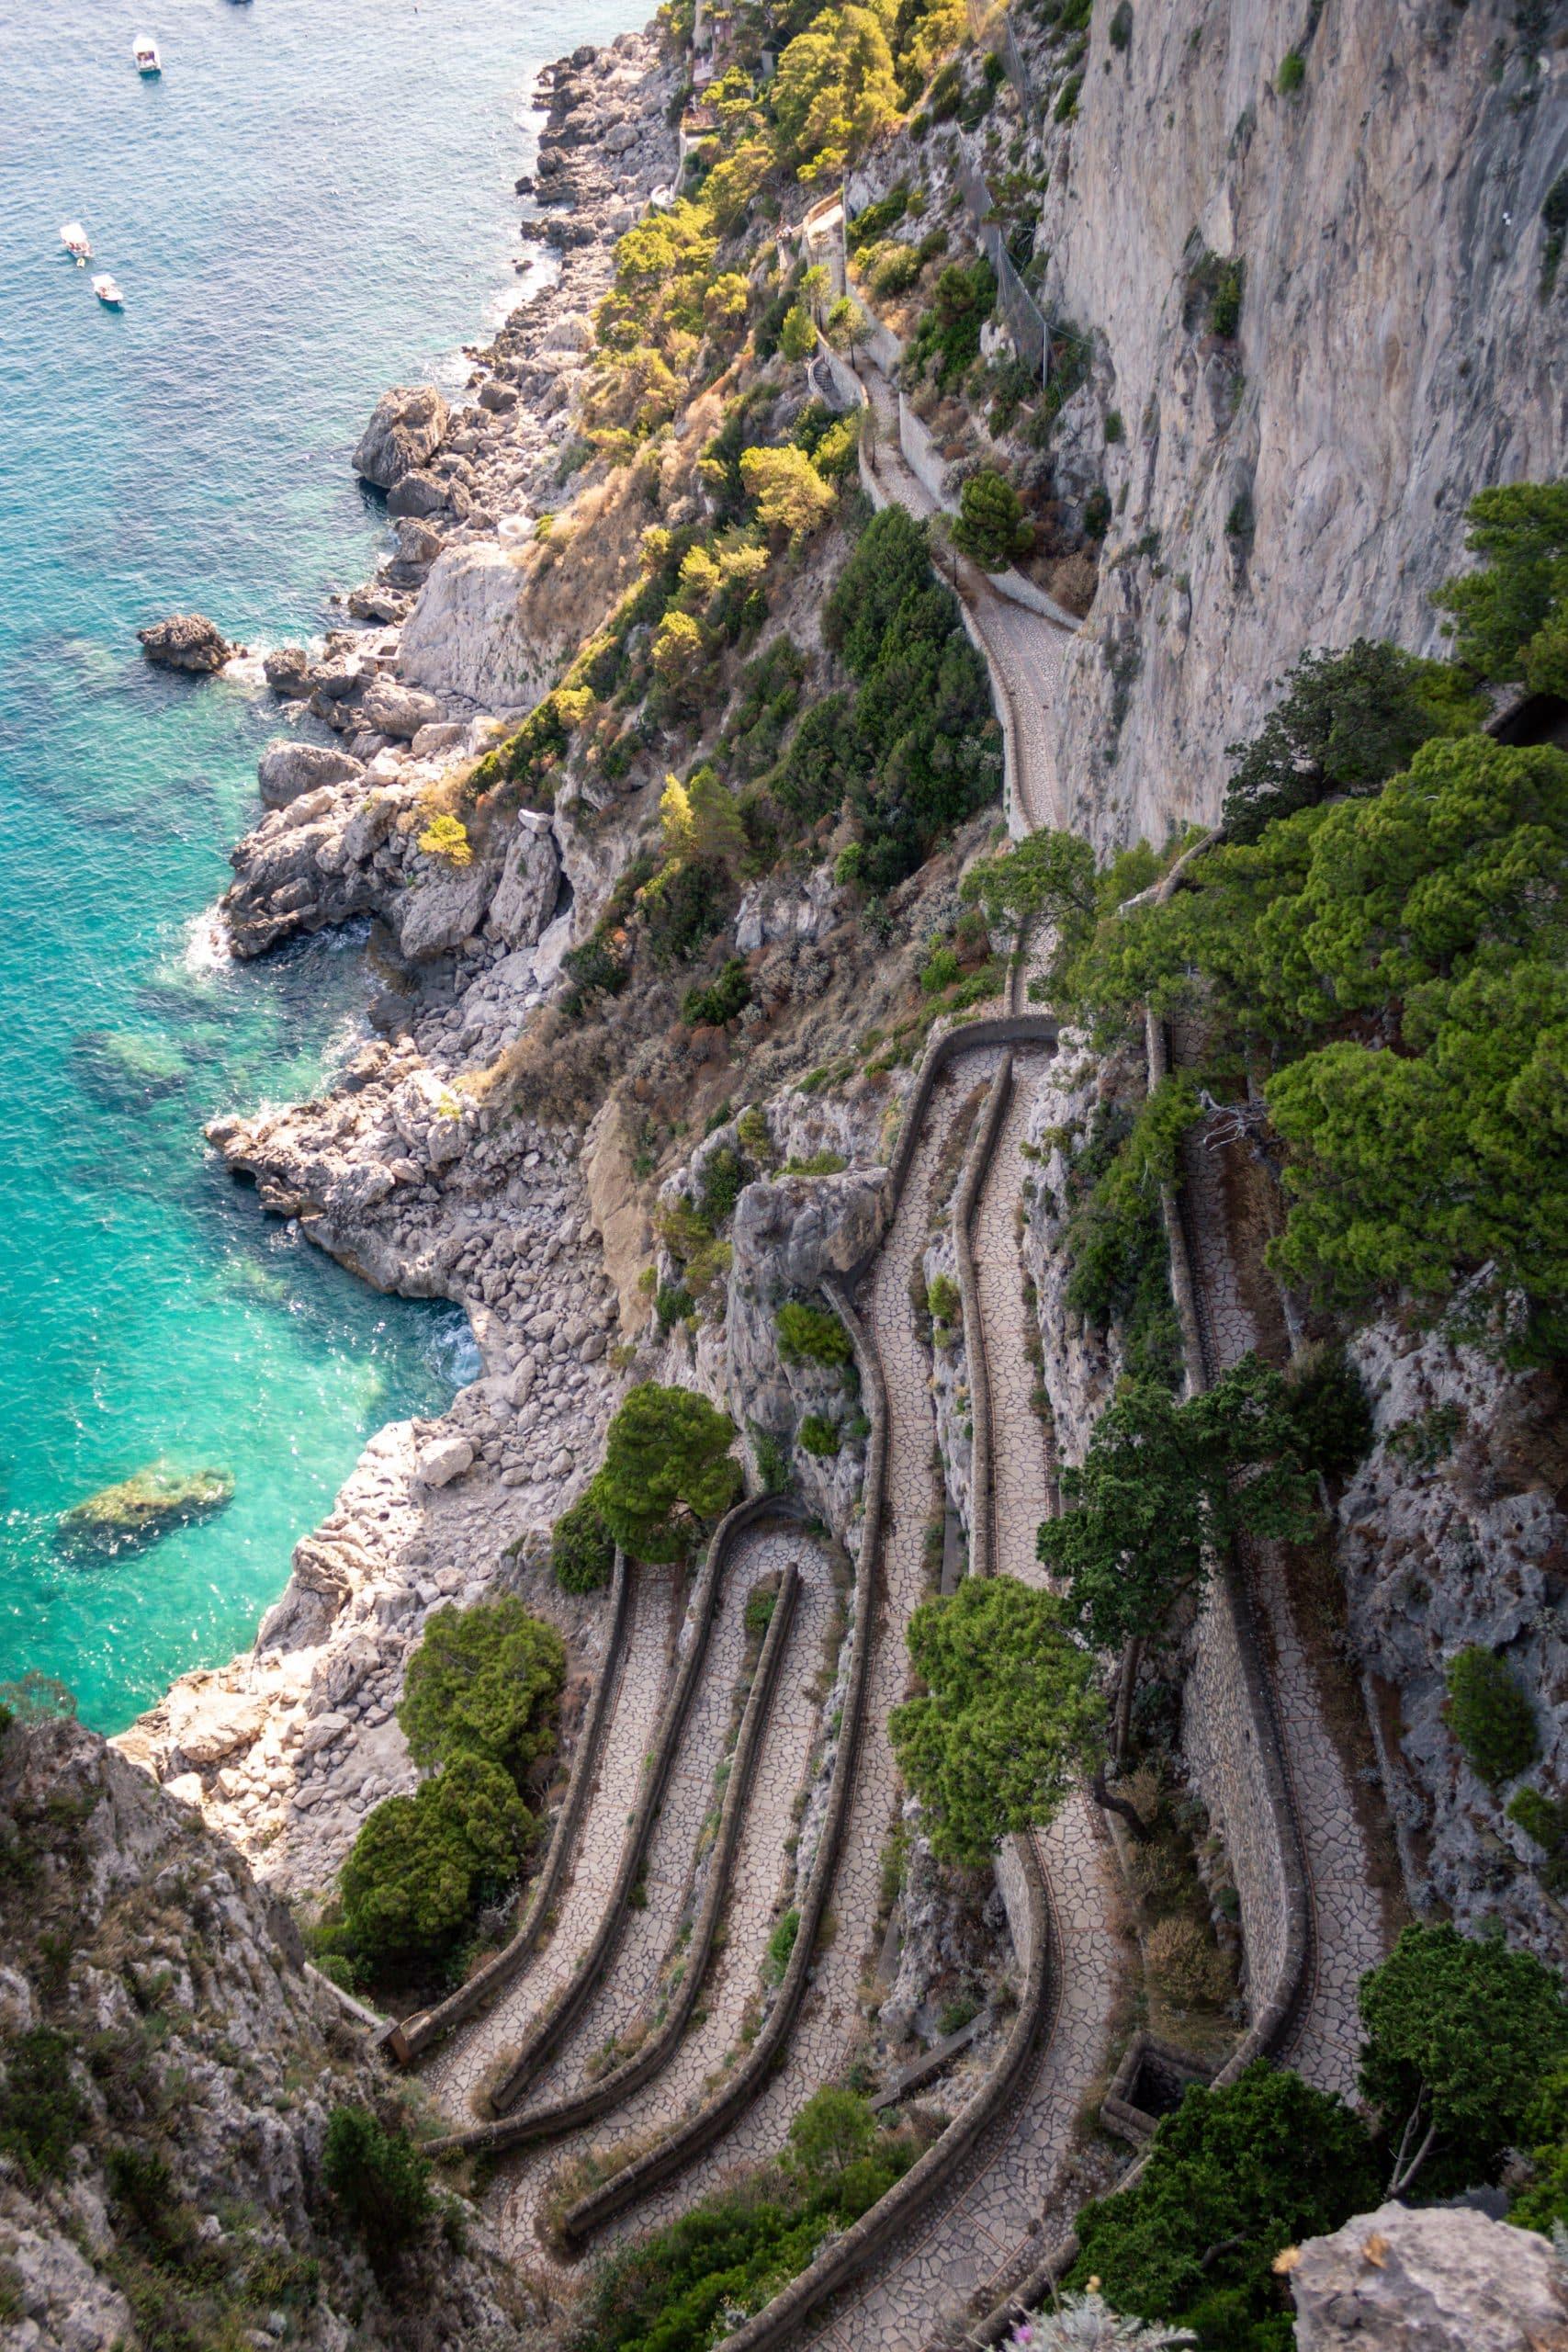 via Krupp, the beautiful Capri island